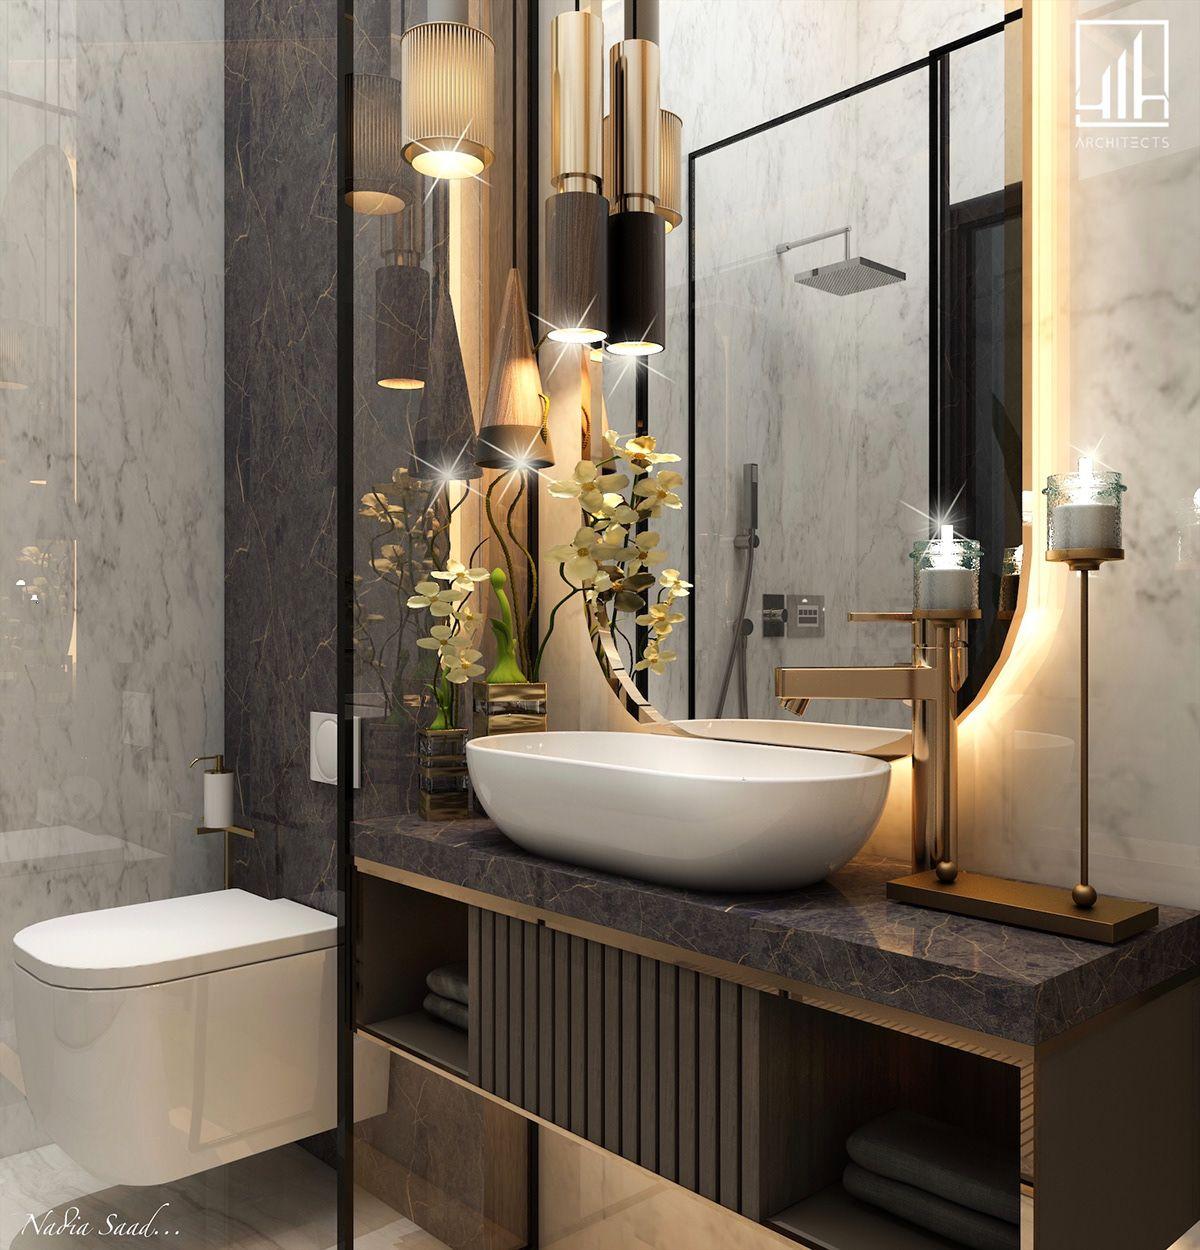 Guest Bathroom In Ksa On Behance Washroom Design Bathroom Design Decor Guest Bathroom Bathroom redecorating ideas png